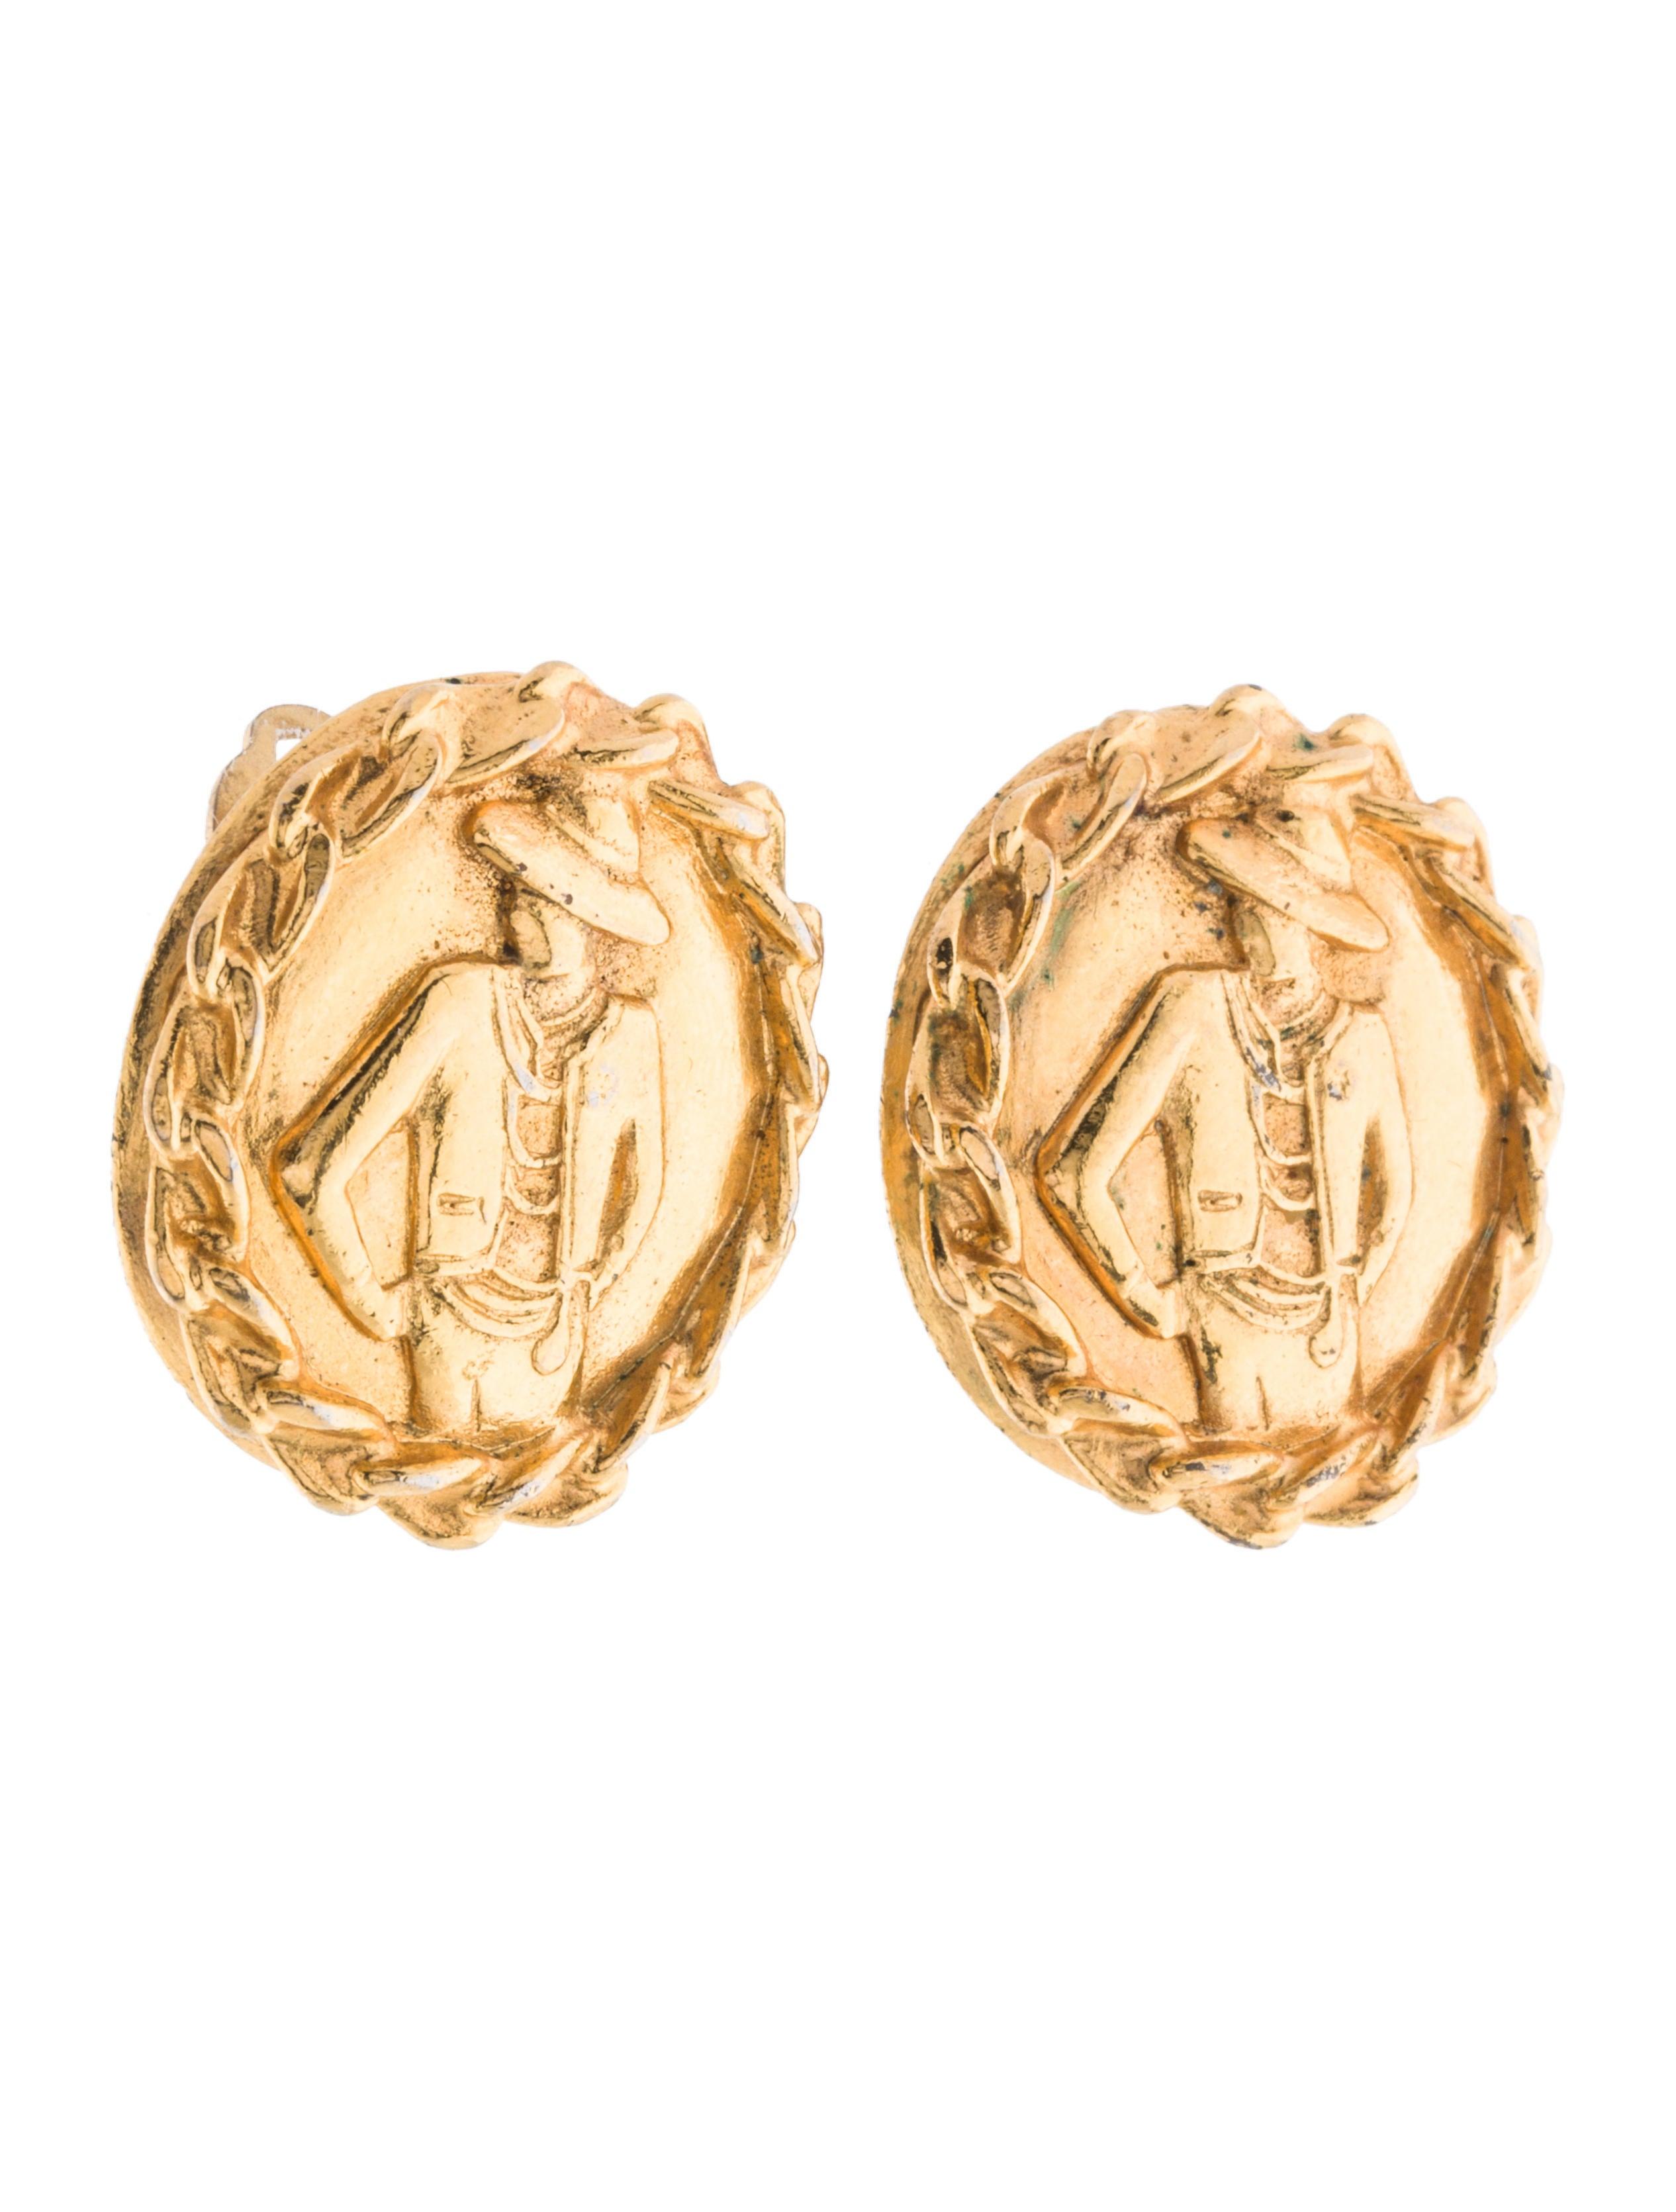 Mademoie Coco Chanel Earrings